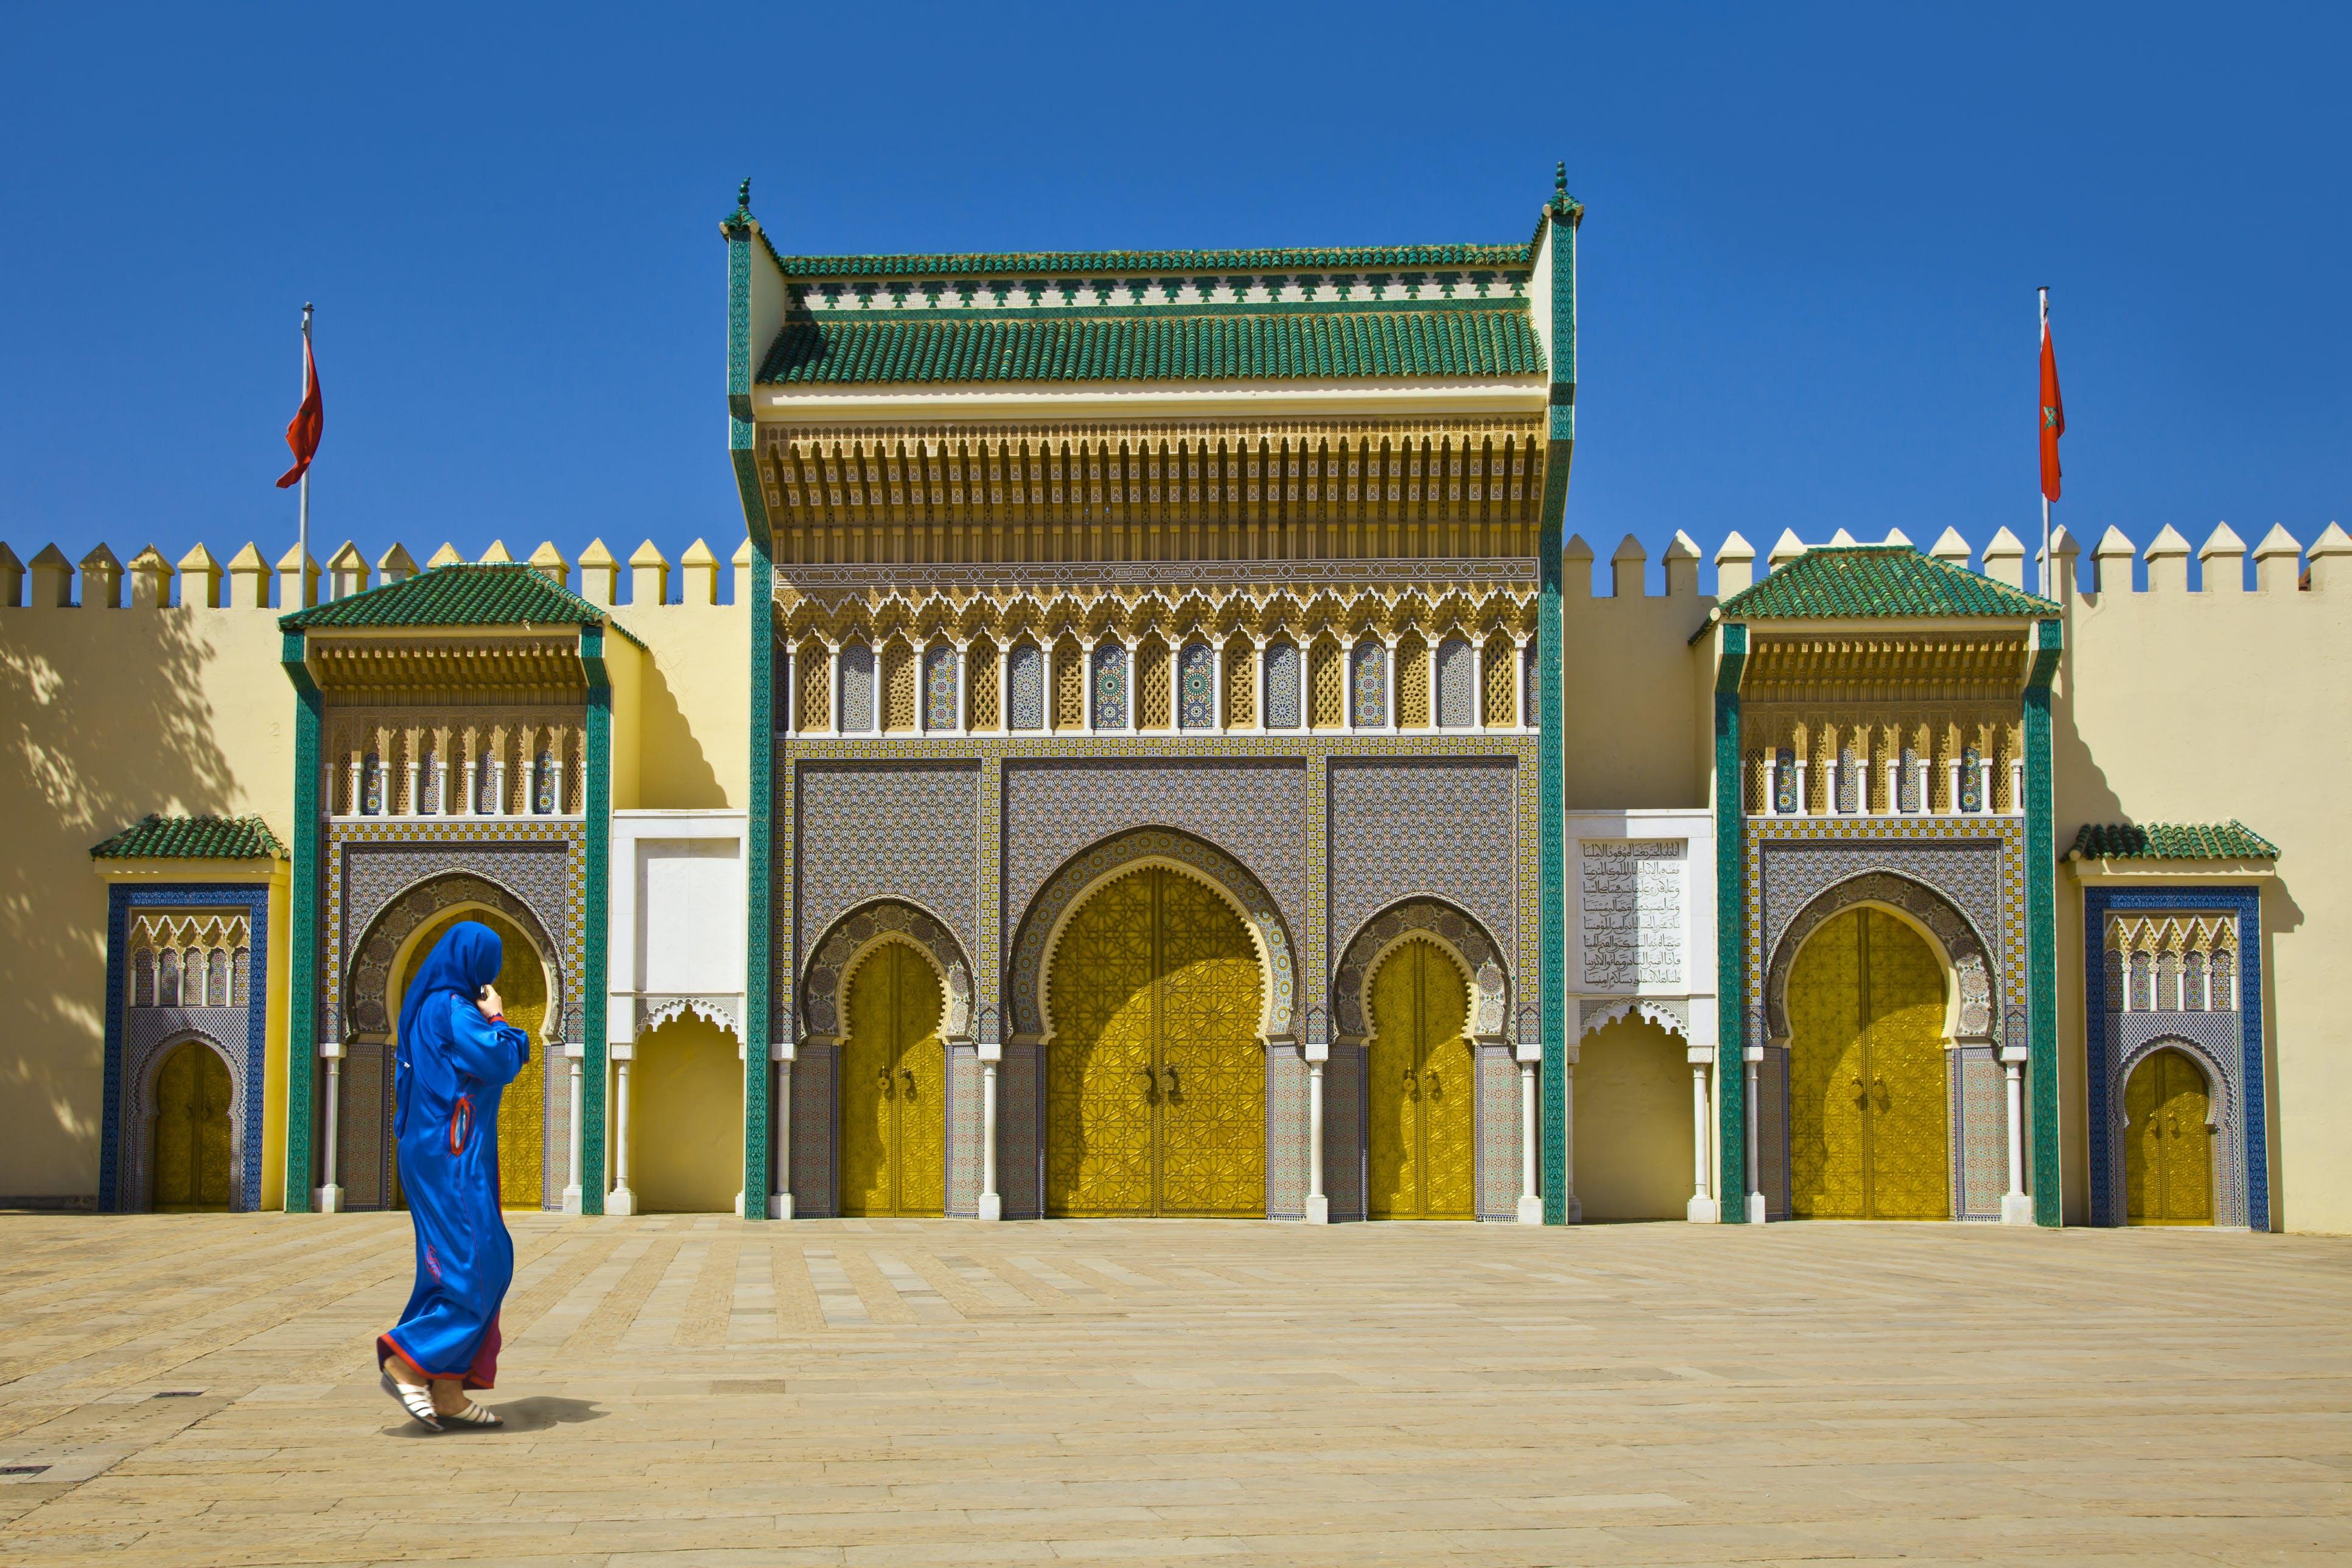 De prachtige architectuur in Fez